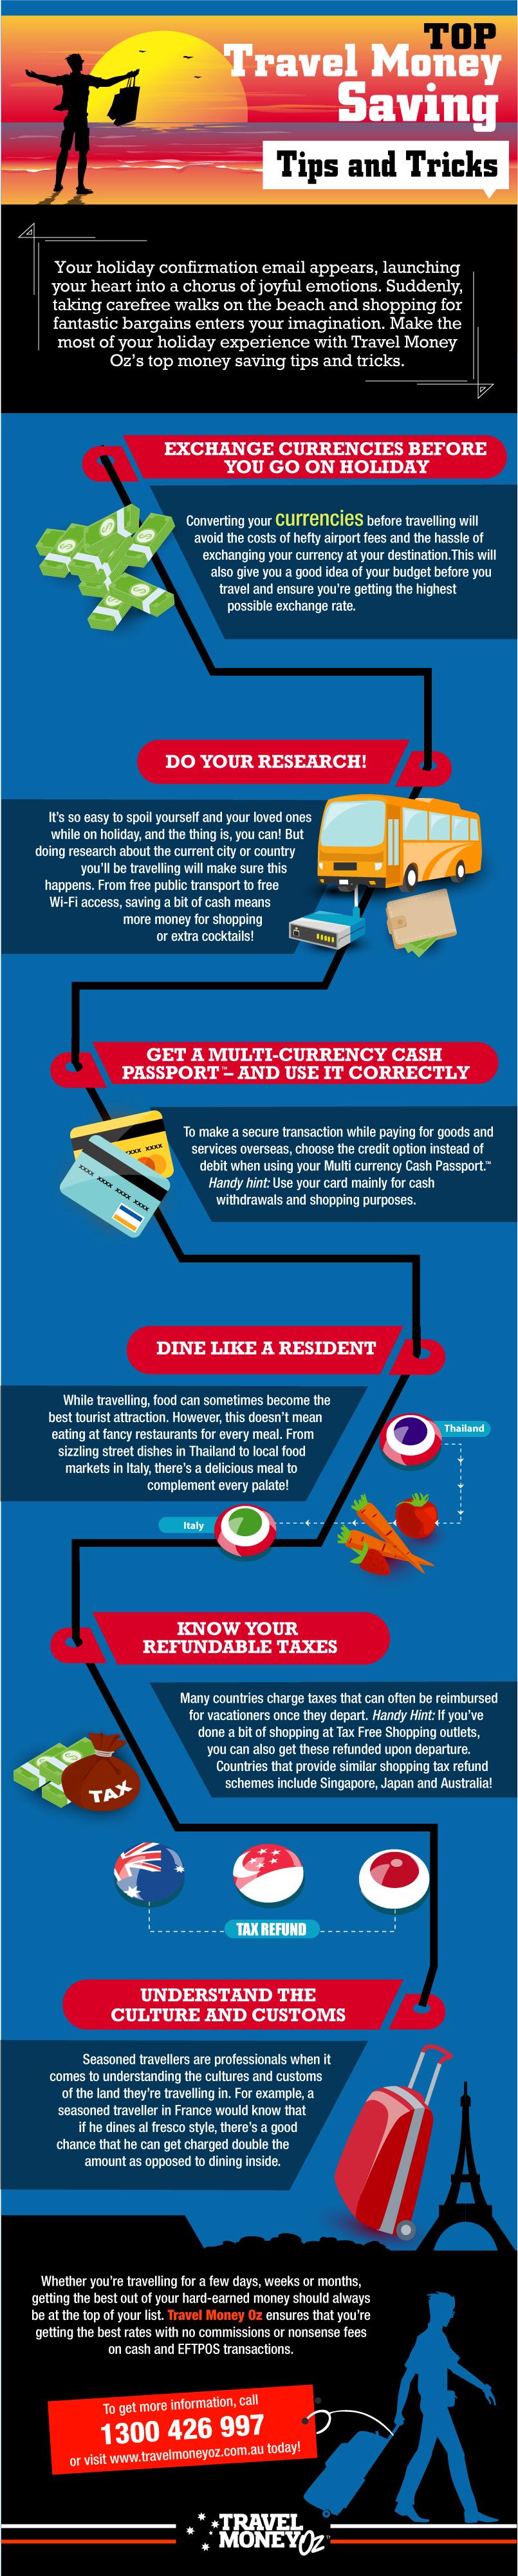 Top Travel Money Saving Tips and Tricks